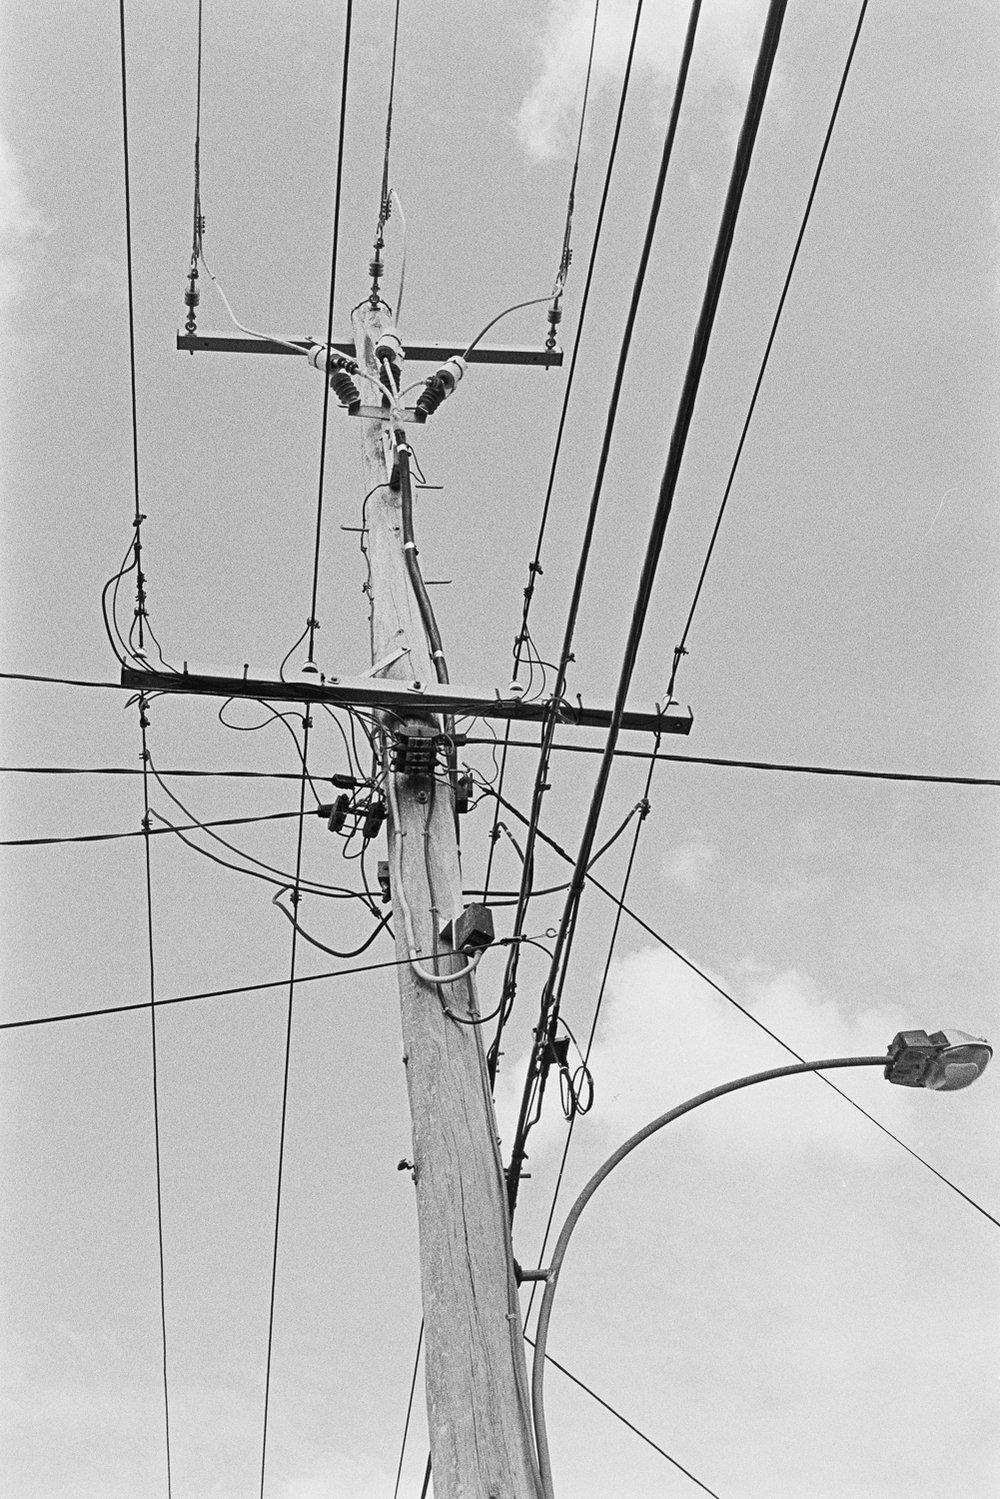 20190105 - Roll 269 - 036-Nick-Bedford,-Photographer-Black and White, Brisbane, Kodak TRI-X 400, Leica M7, Street Photography, Voigtlander 35mm F1.7.jpg